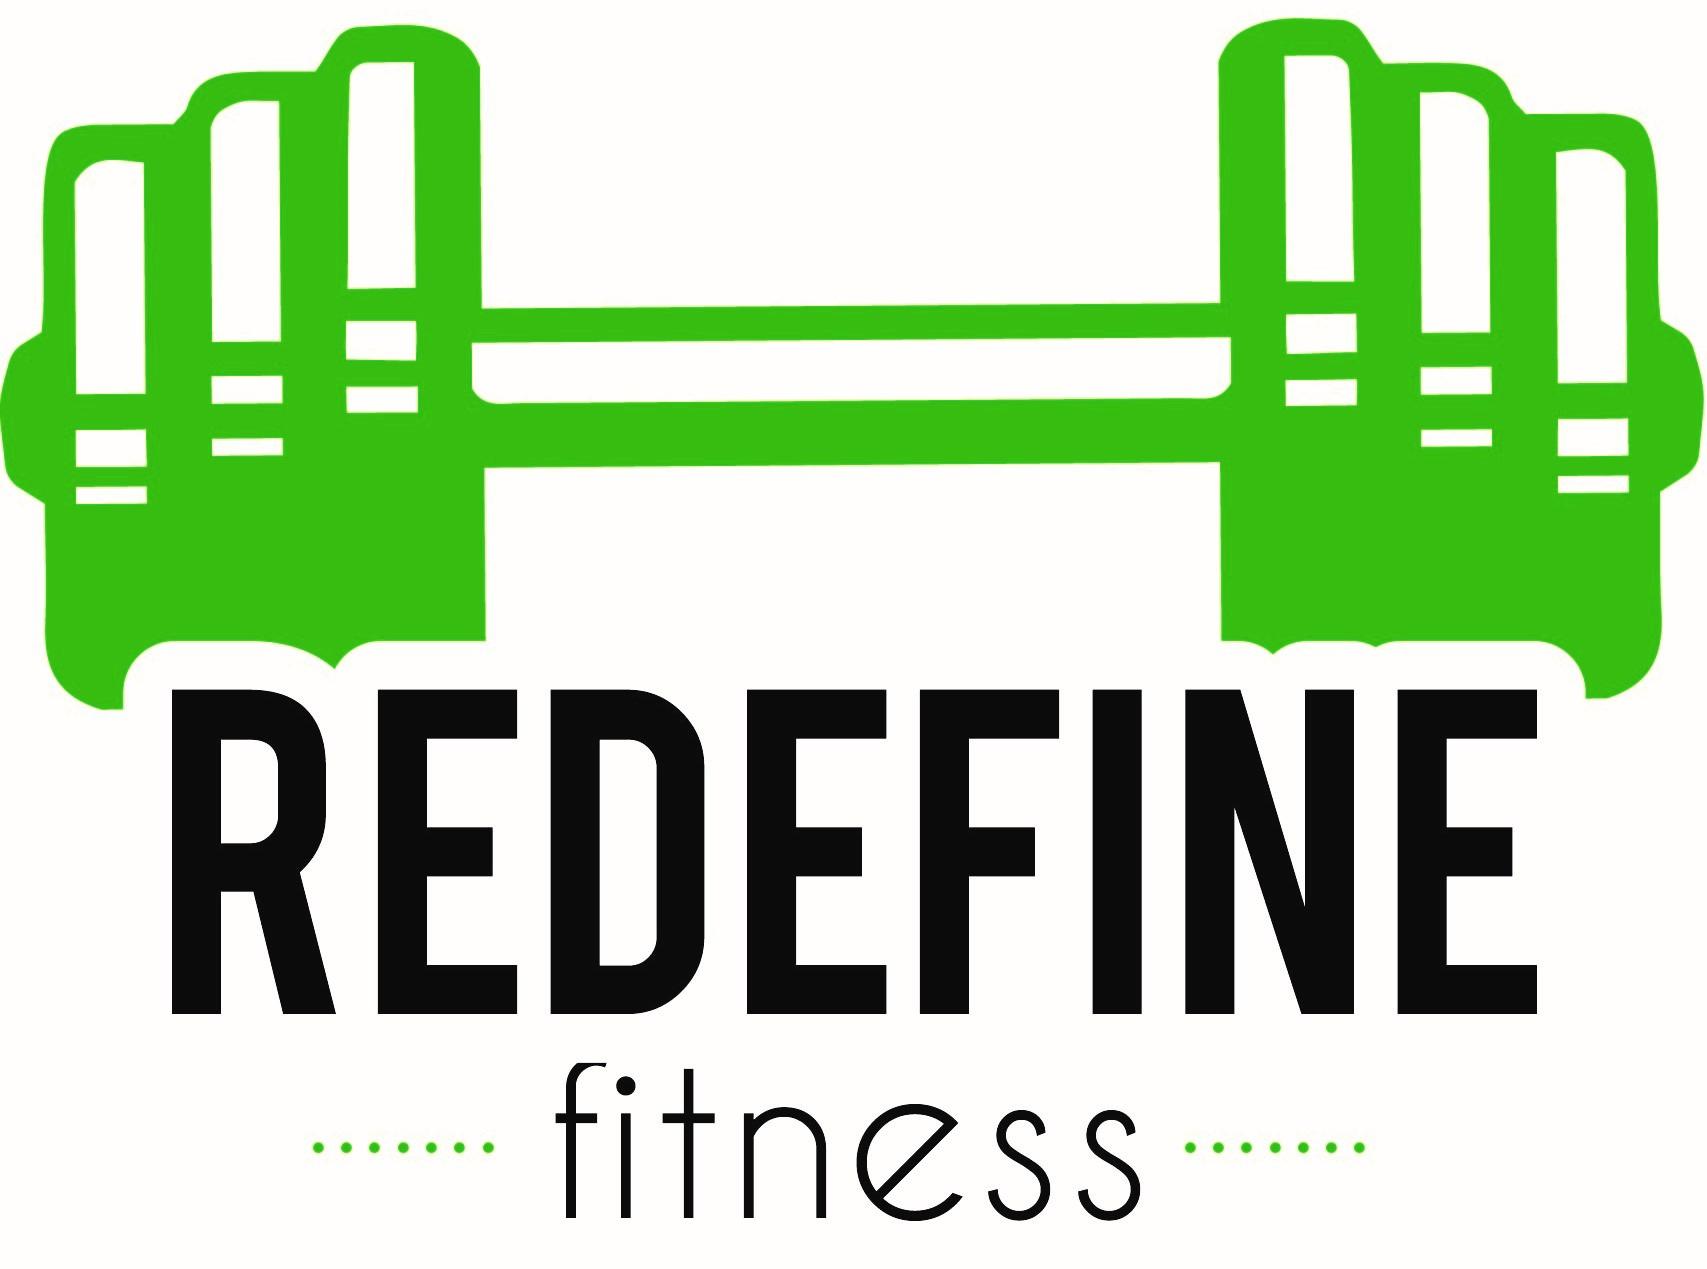 Redefine Fitness logo